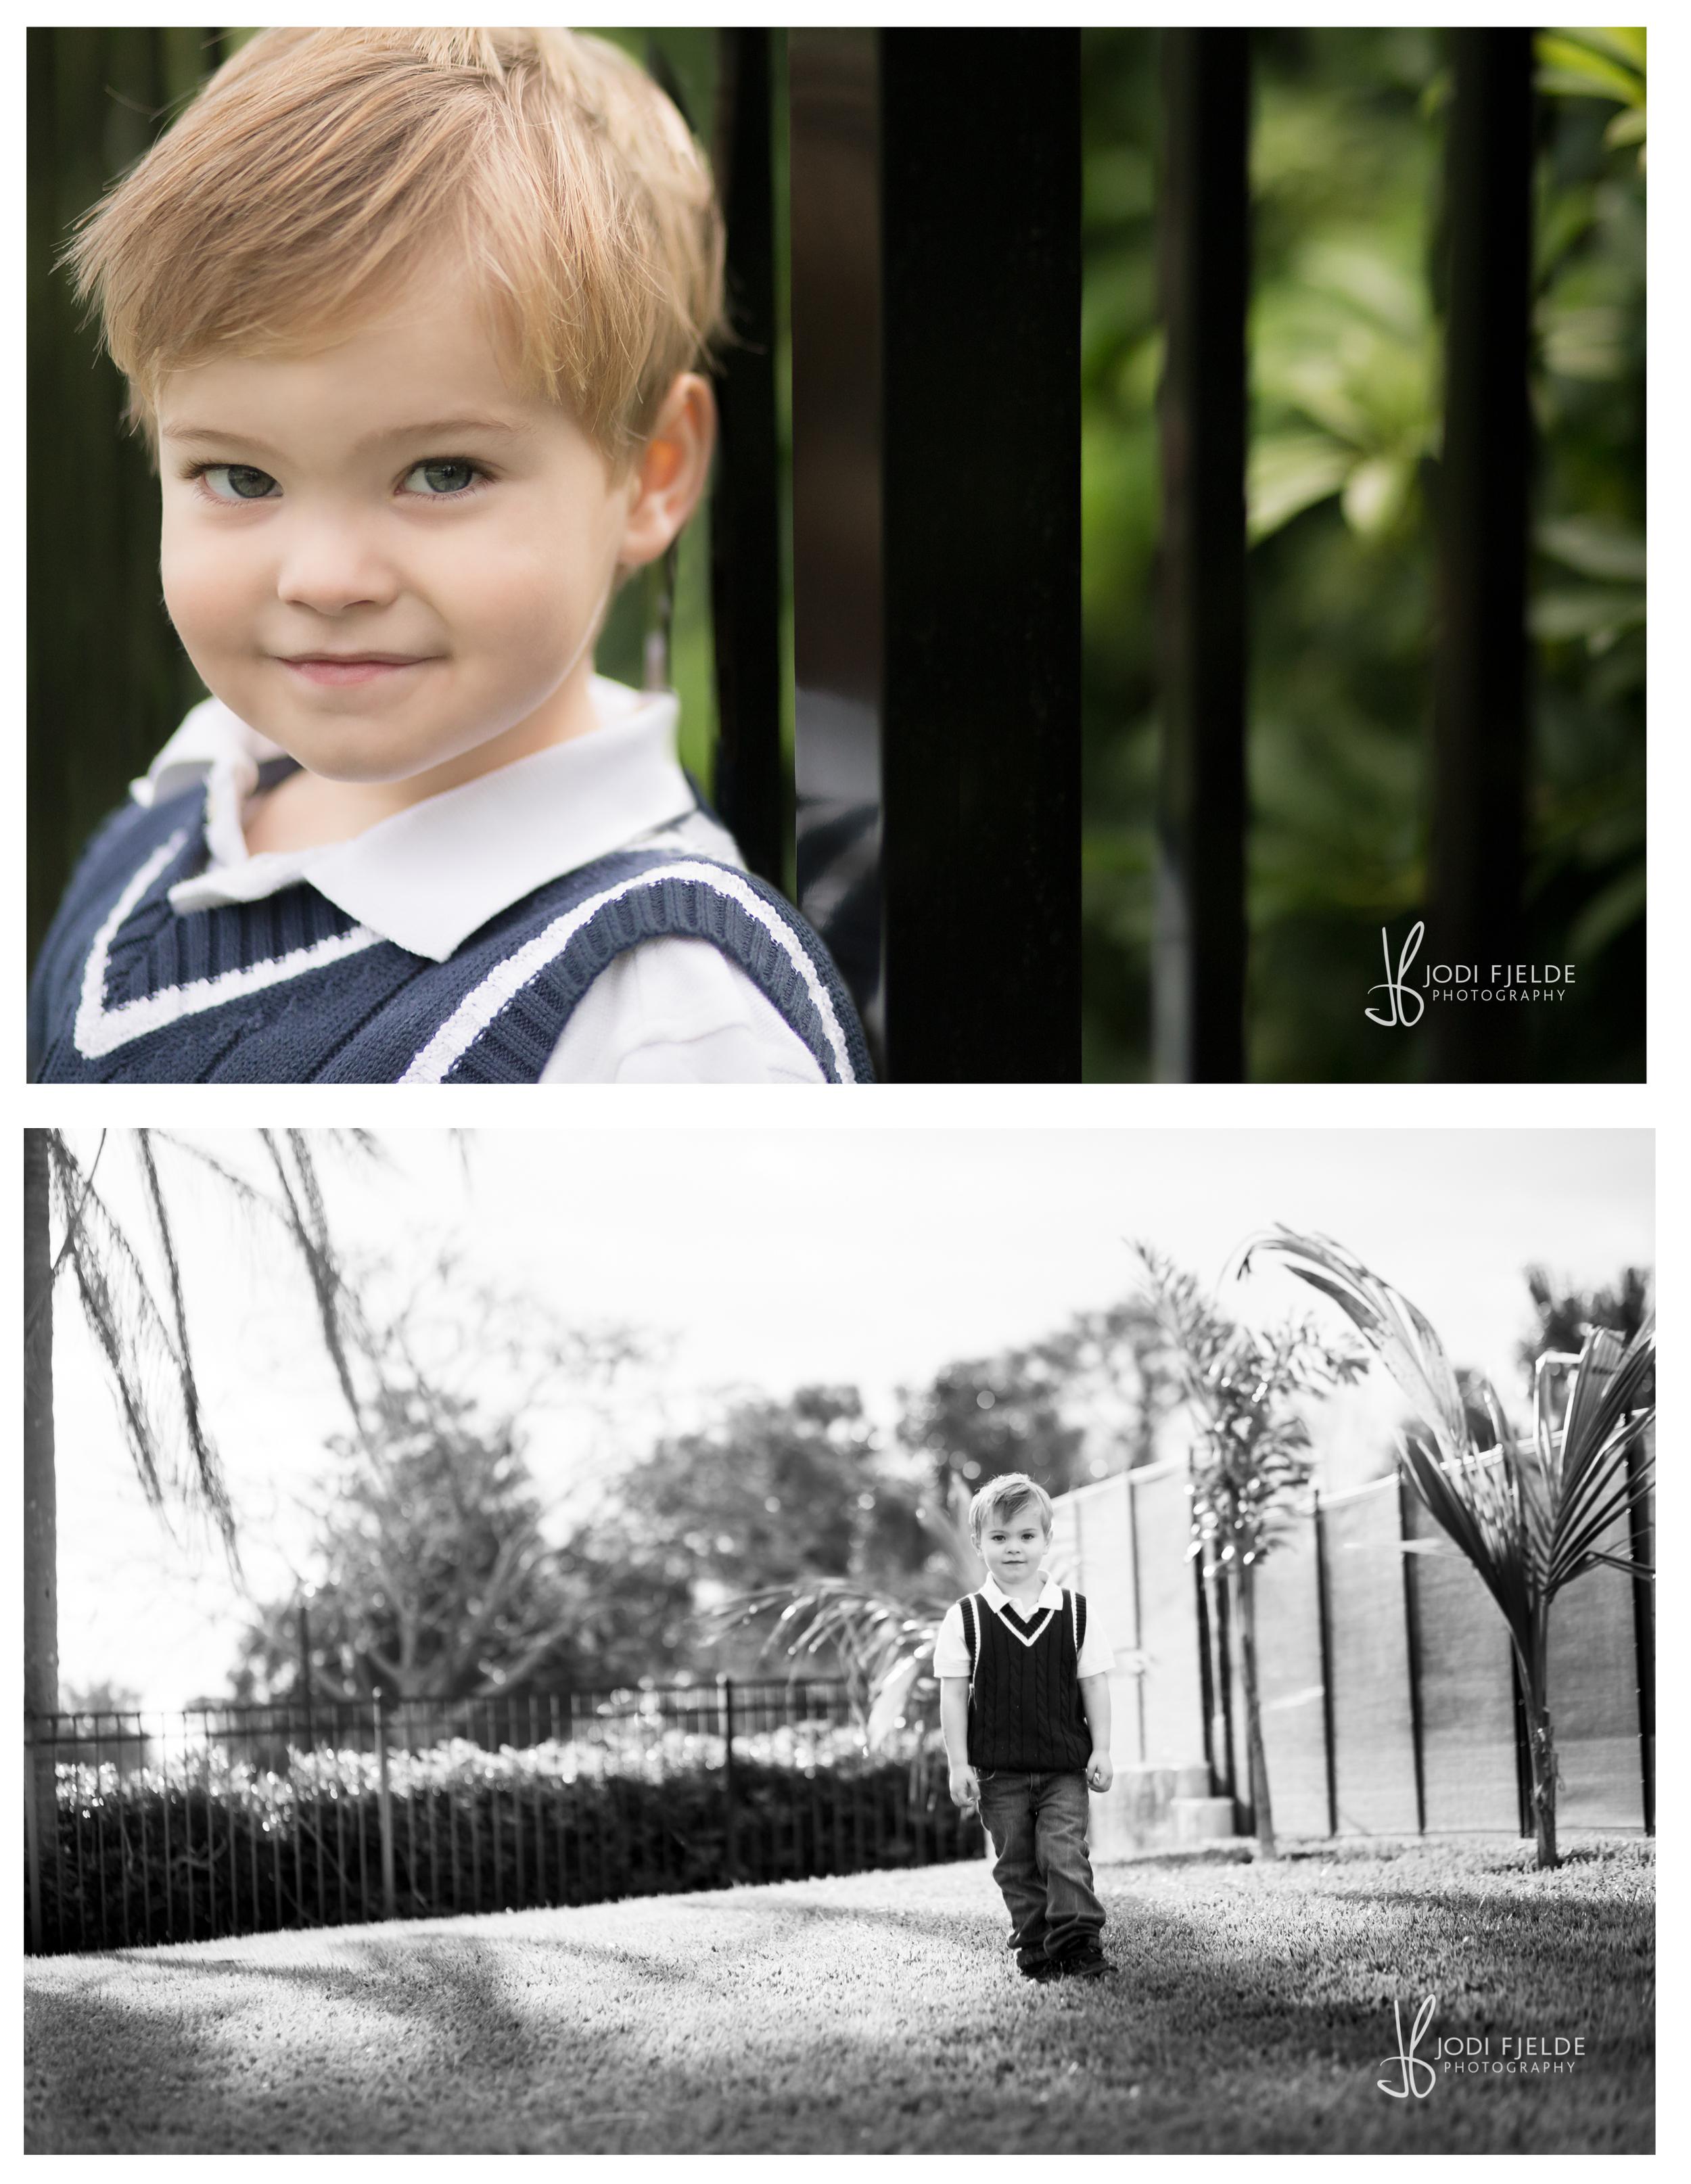 Boynton_Beach_Child_Photographer_Brady_Jodi_Fjelde_Photography 10.jpg